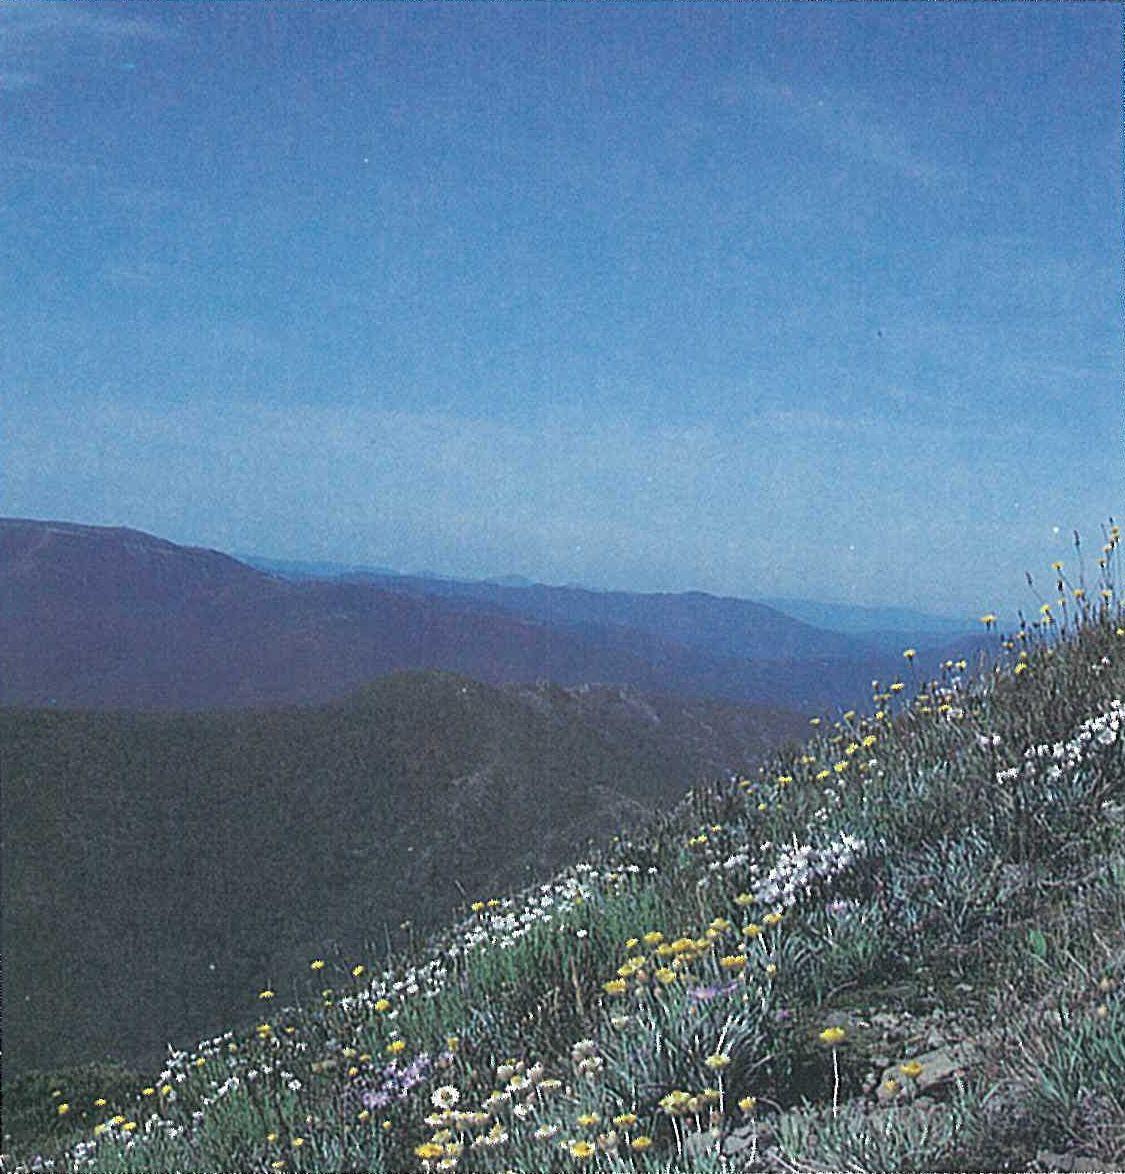 Snowfields; heathland. Open-heath to herbfield on steep rocky slope. Brachyscome spathulata, Craspedia sp., Grevillea australis (sparse), Leucochrysum albicans, Luzula novae-cambriae, Rhodanthe anthemoides and Hypochoeris radicata. Mt Feathertop summit area.